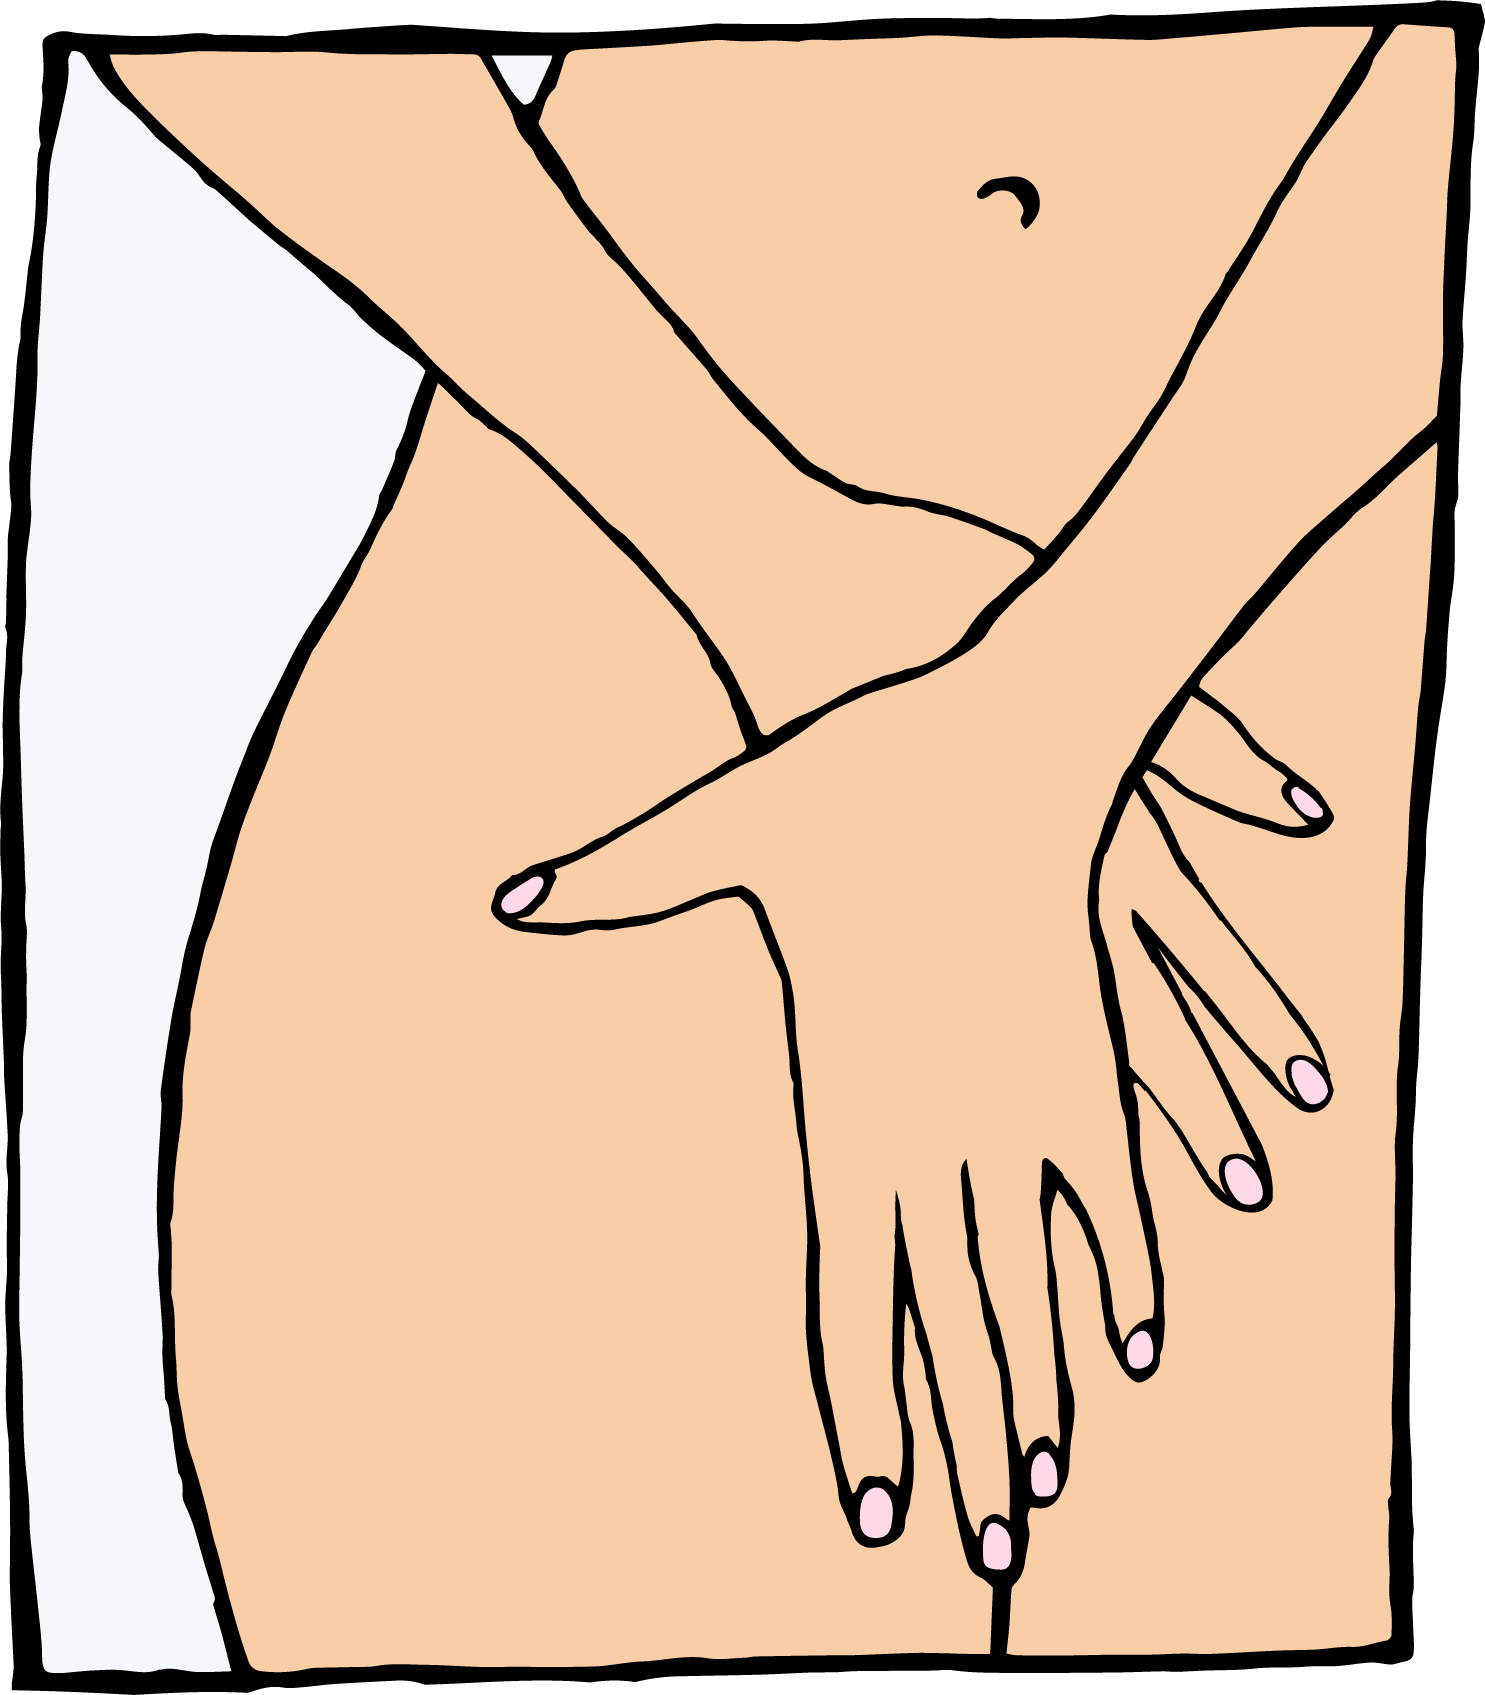 Vagina, Klitoris, Schamlippen